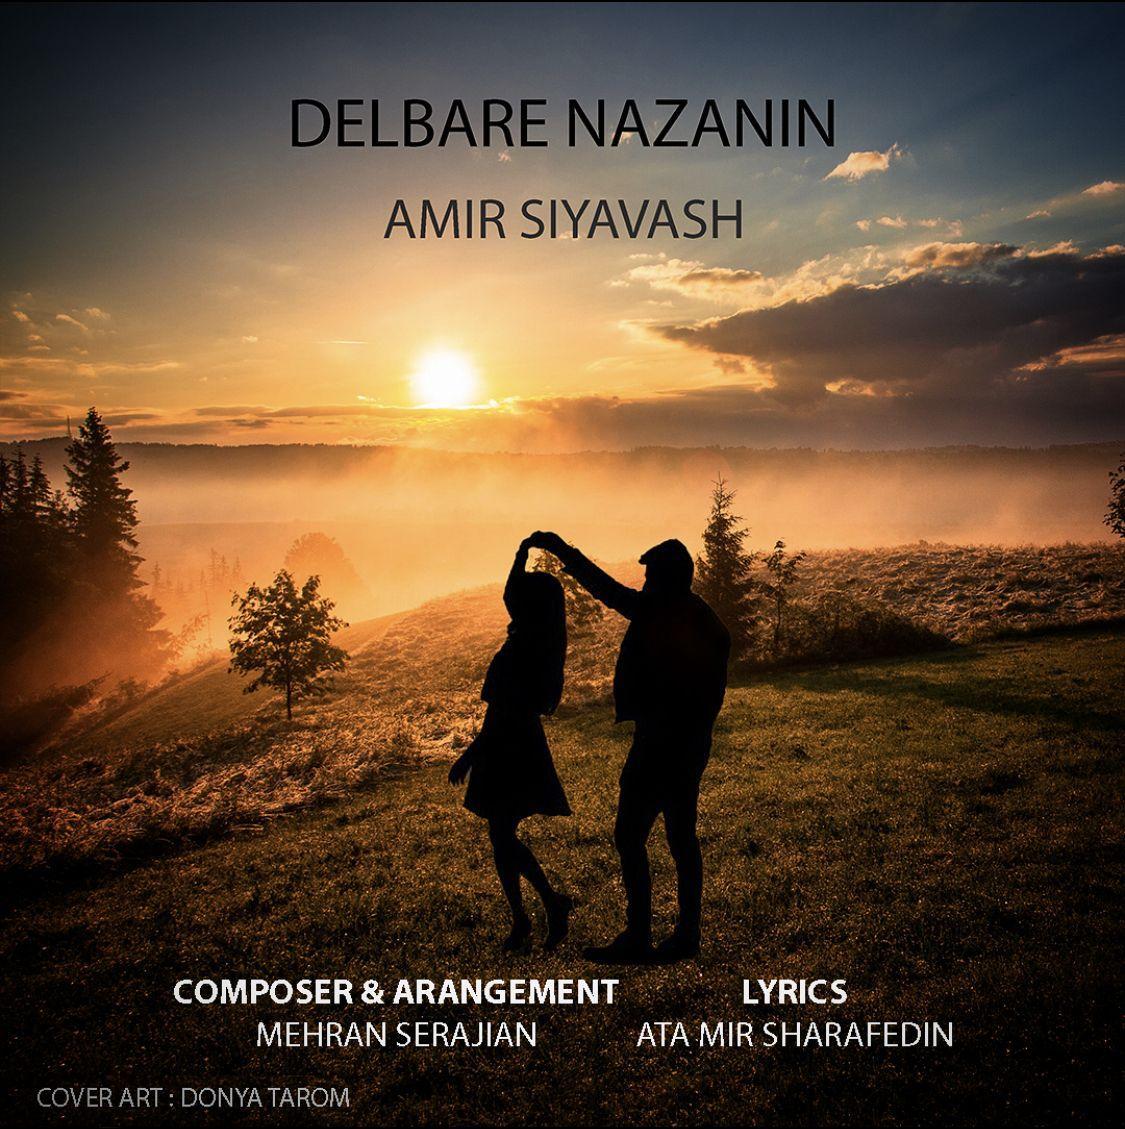 Amir Siyavash – Delbare Nazanin